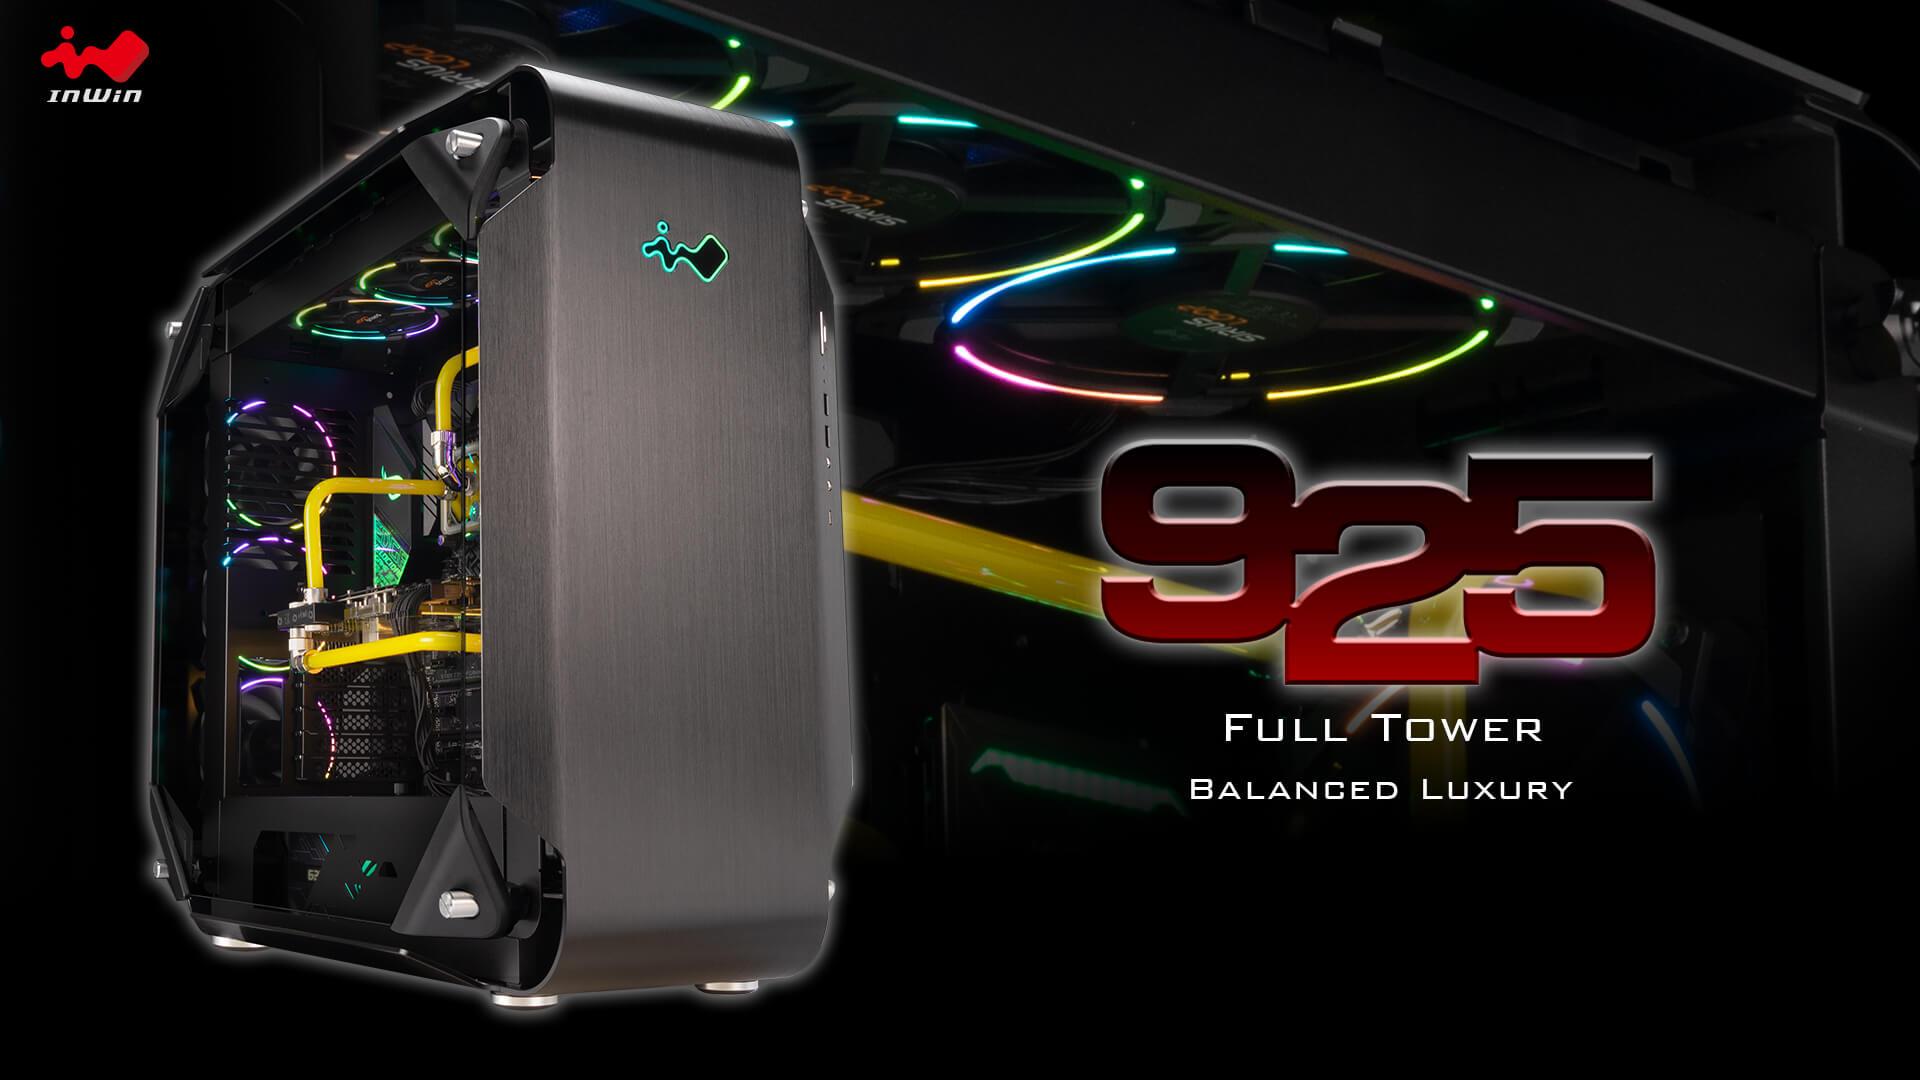 InWin 925 Full Tower